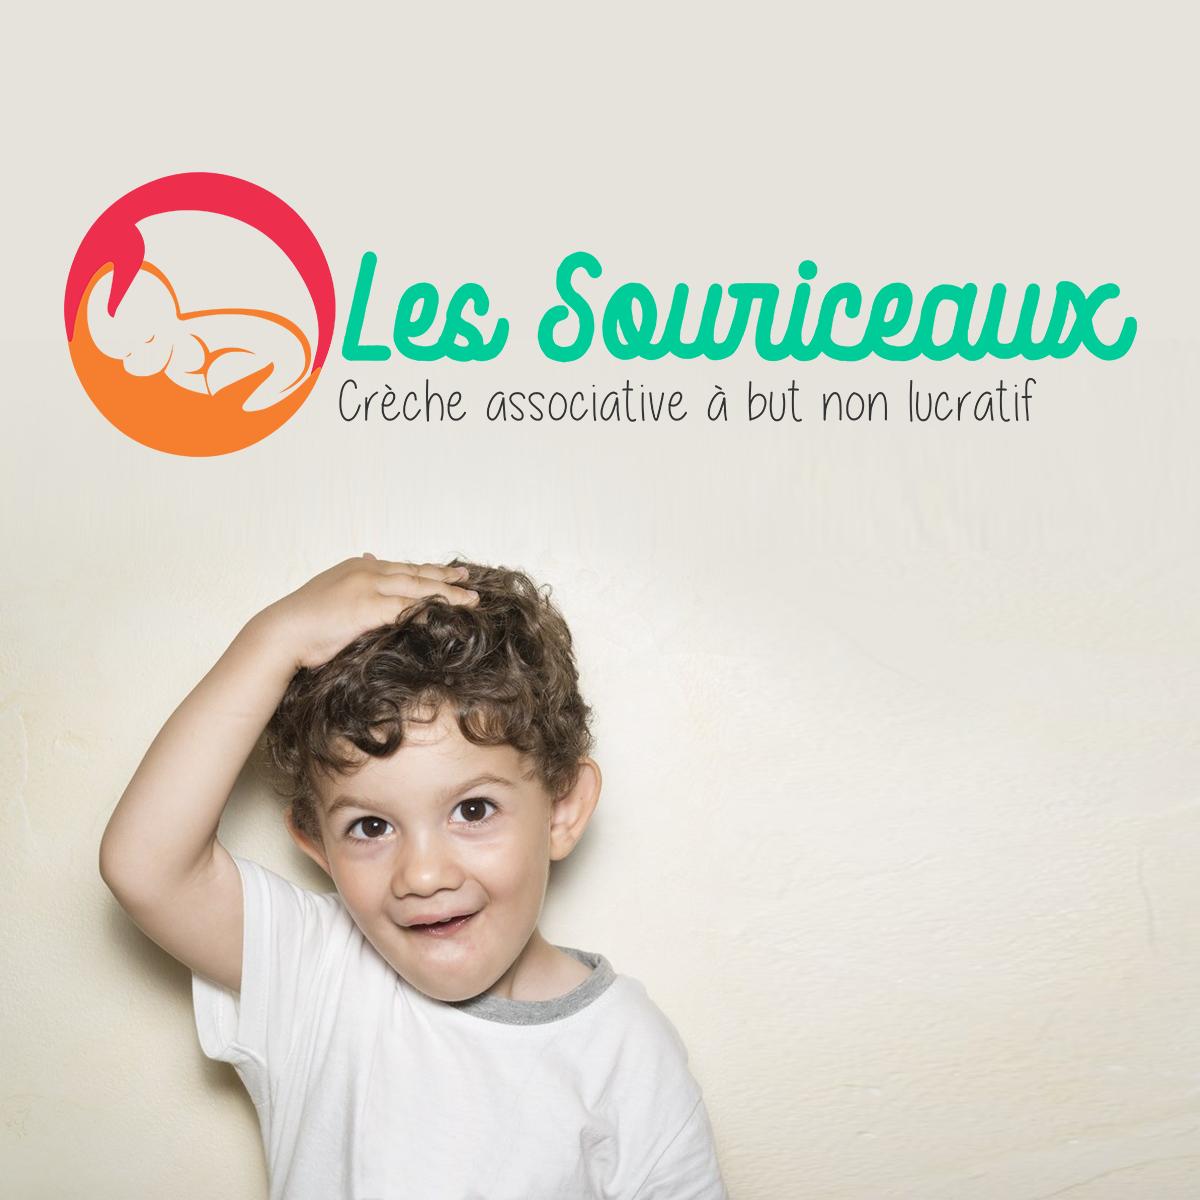 souriceaux-logo